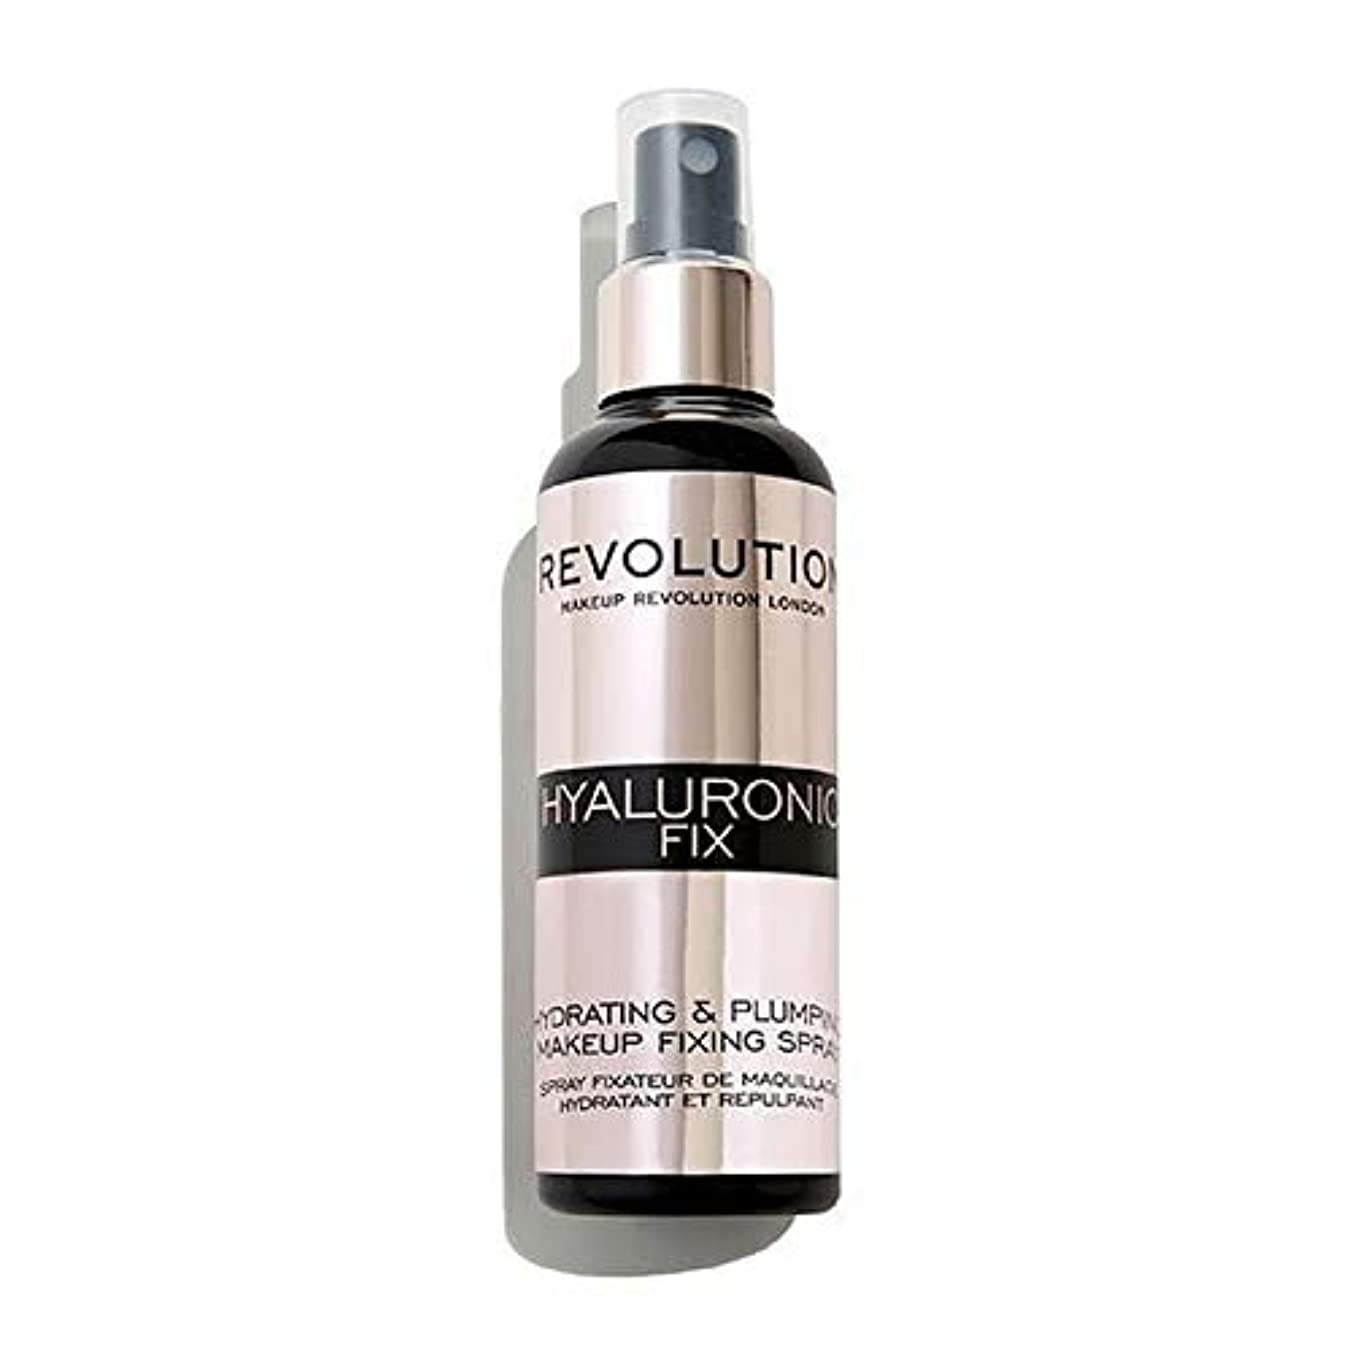 [Revolution ] 化粧革命ヒアルロン固定スプレー - Makeup Revolution Hyaluronic Fixing Spray [並行輸入品]